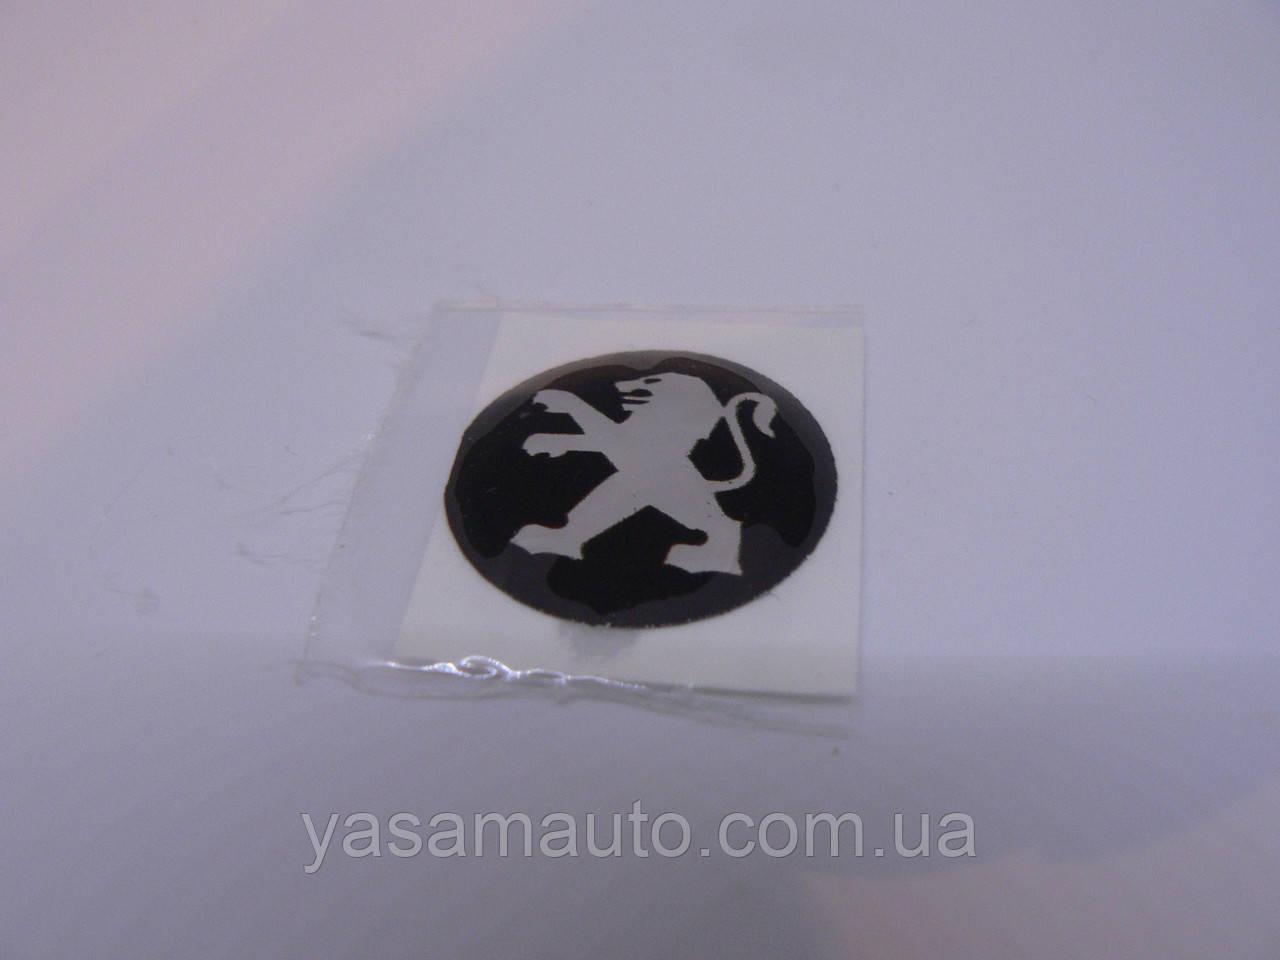 Наклейка s круглая PEUGEOT 20х20х1.2мм силиконовая эмблема логотип марка бренд в круге на авто Пежо